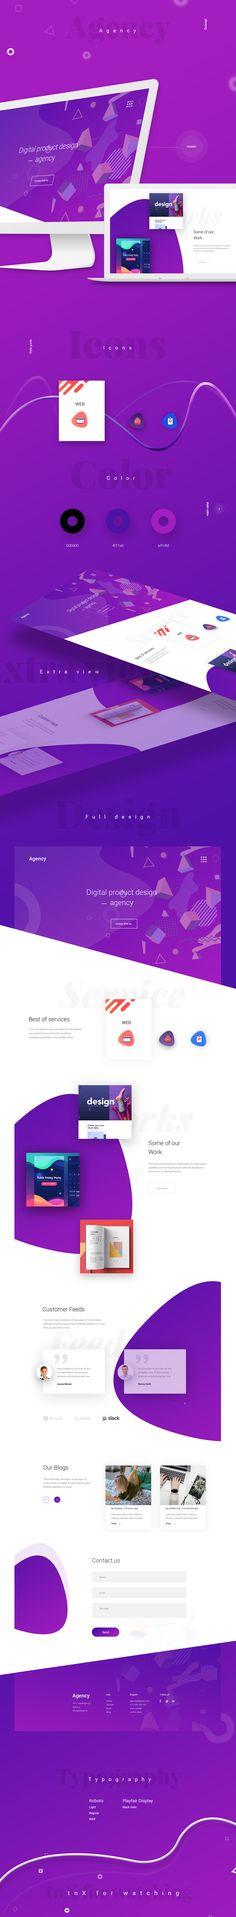 Agency Web Design on Behance